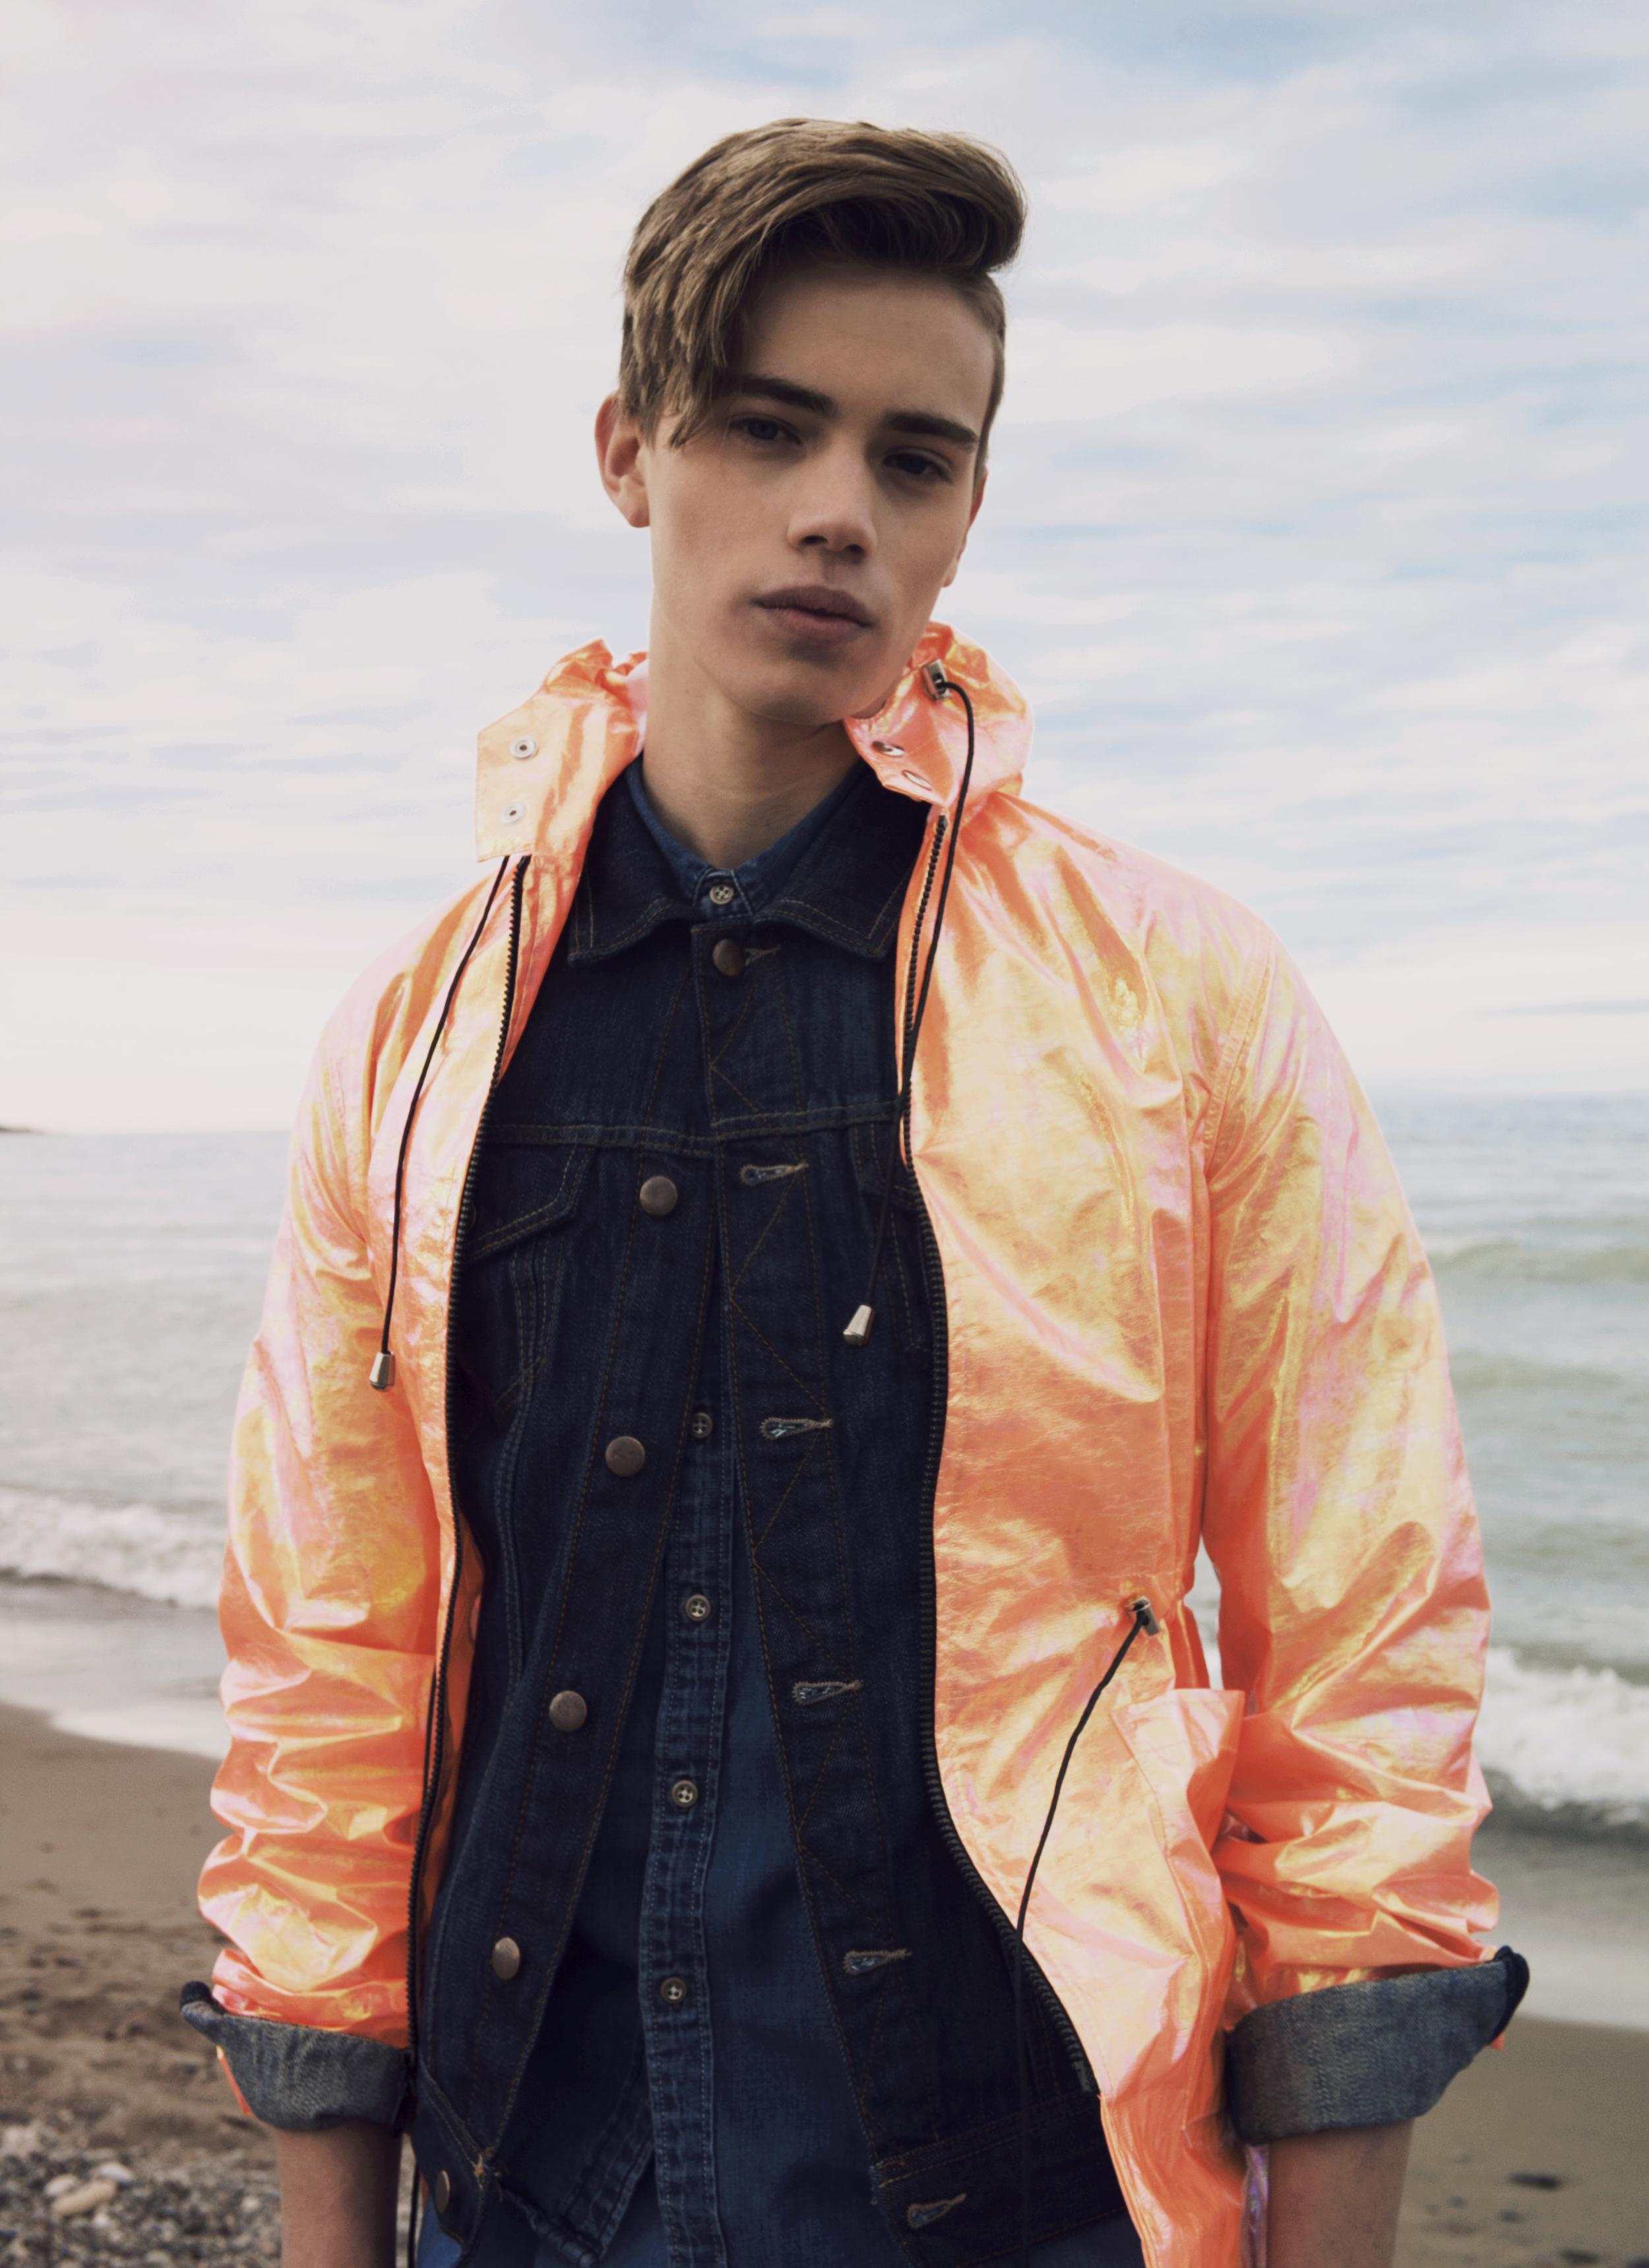 Jacket and trousers ANDREW COIMBRA, denim jacket RAG & BONE, denim shirt DIESEL